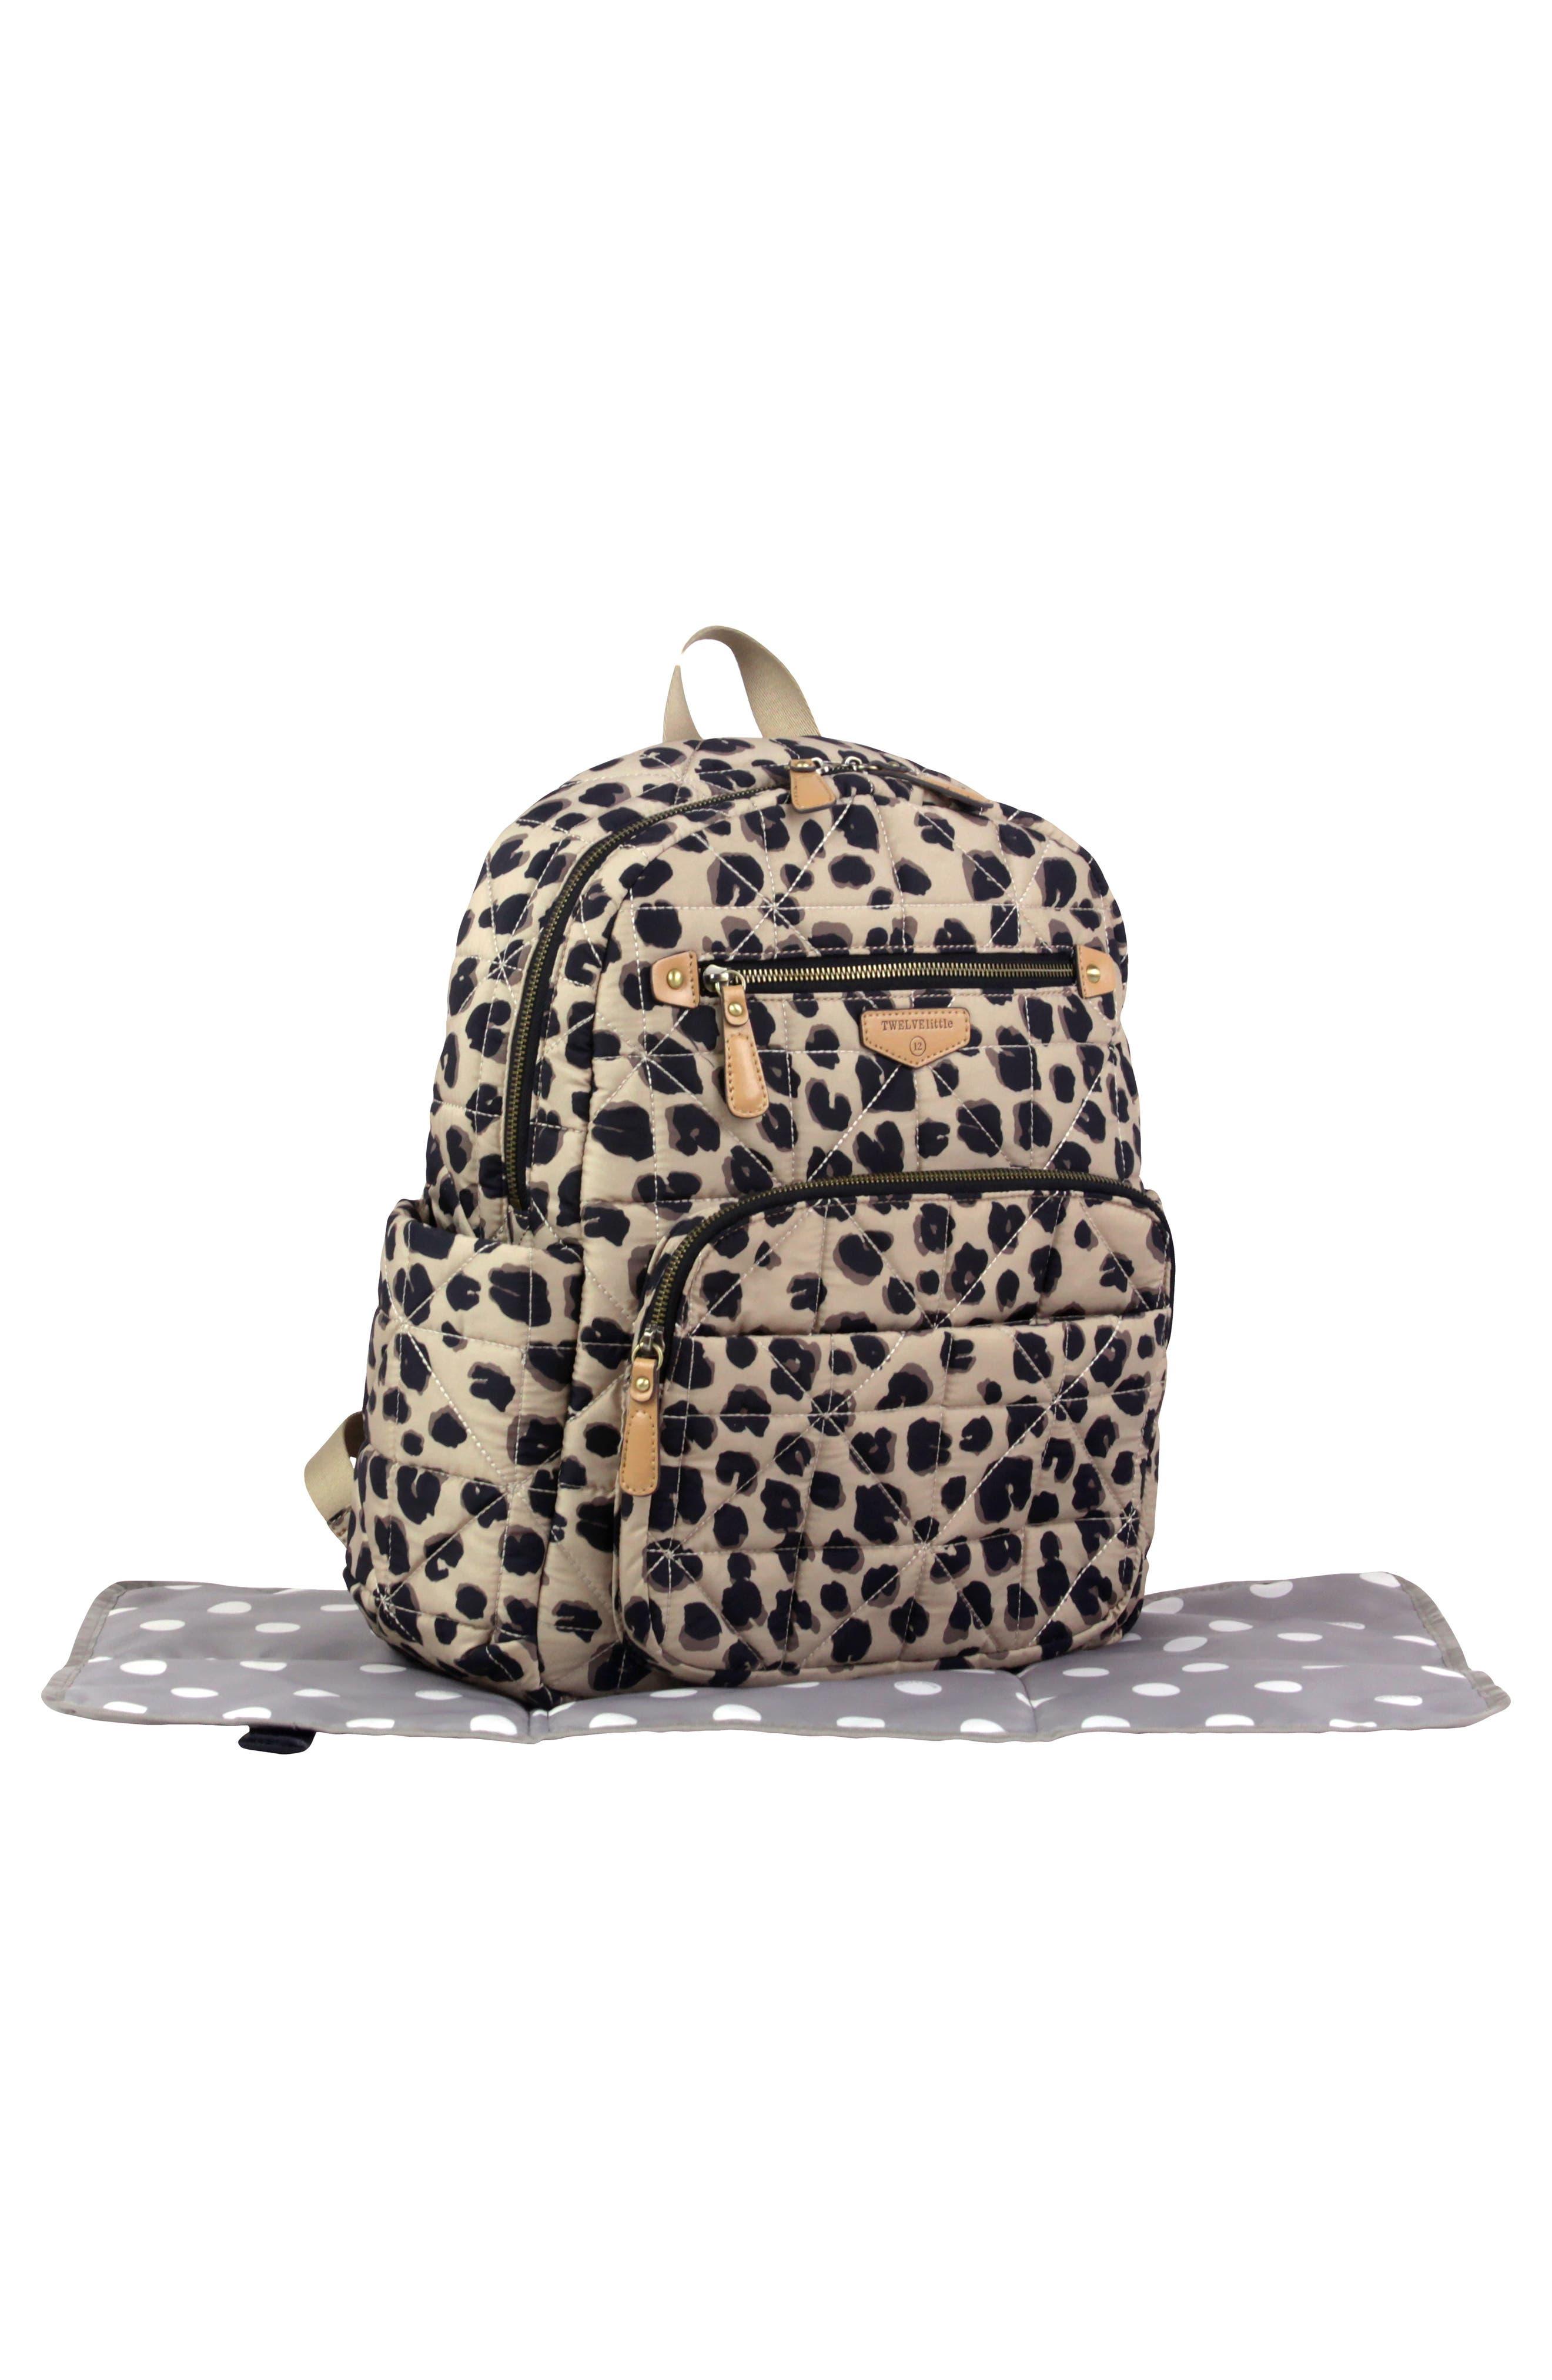 TWELVELITTLE, Quilted Water Resistant Nylon Diaper Backpack, Alternate thumbnail 4, color, LEOPARD PRINT